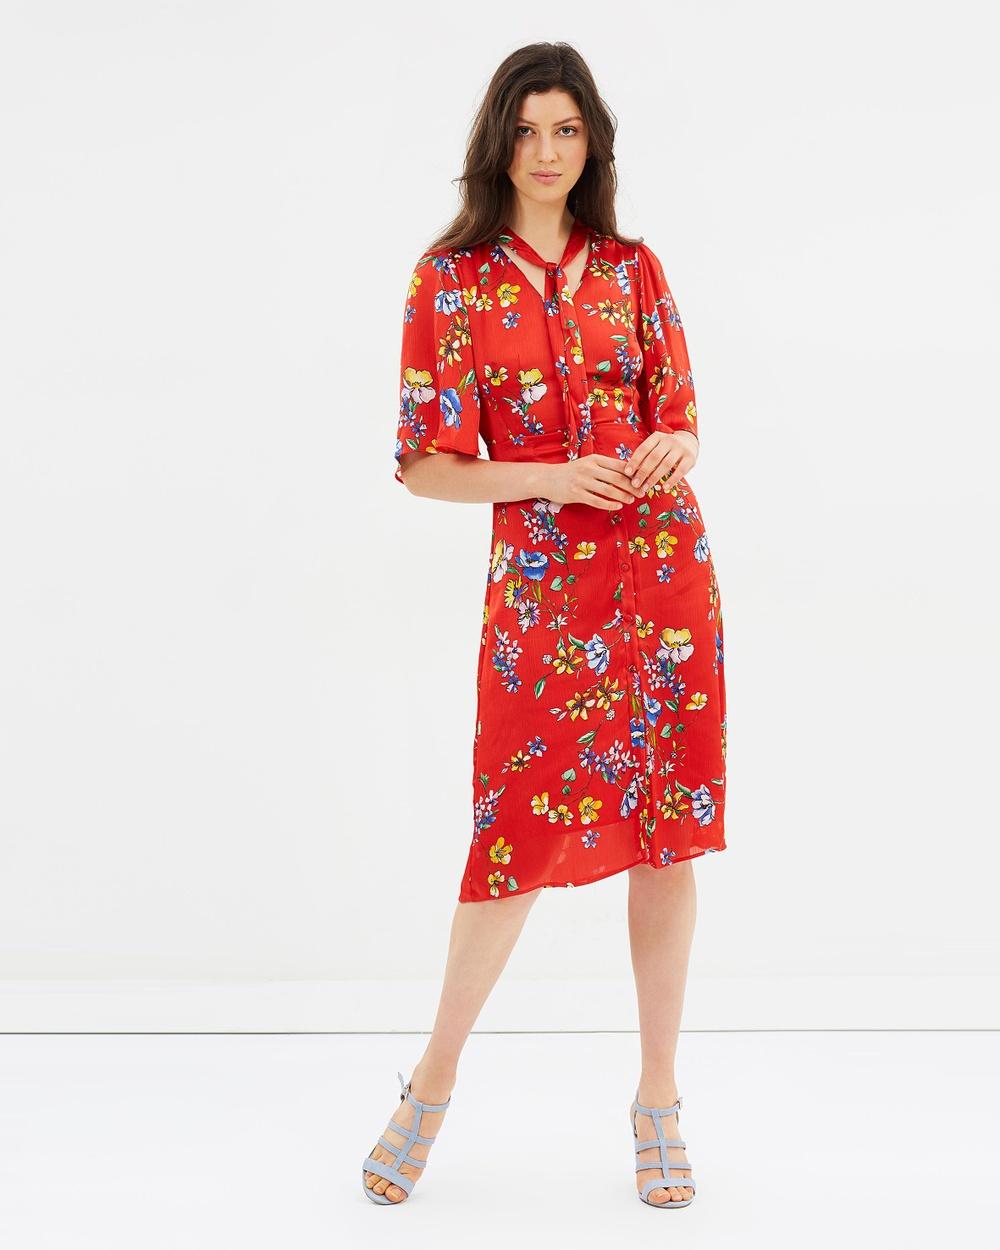 M.N.G Mariam Dress Printed Dresses Red Mariam Dress